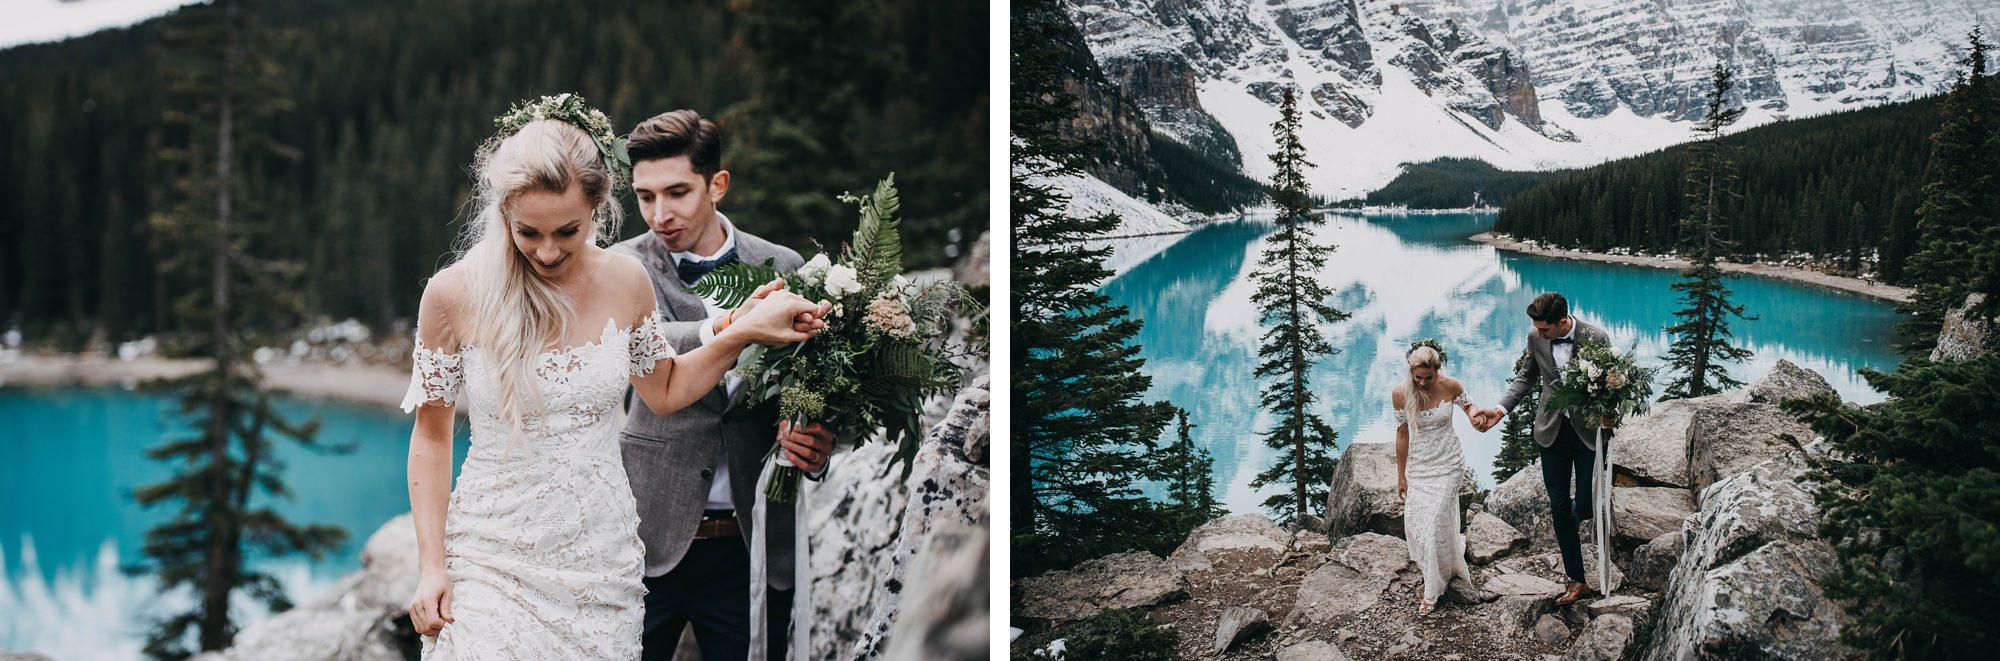 scenic adventurous mountain elopement